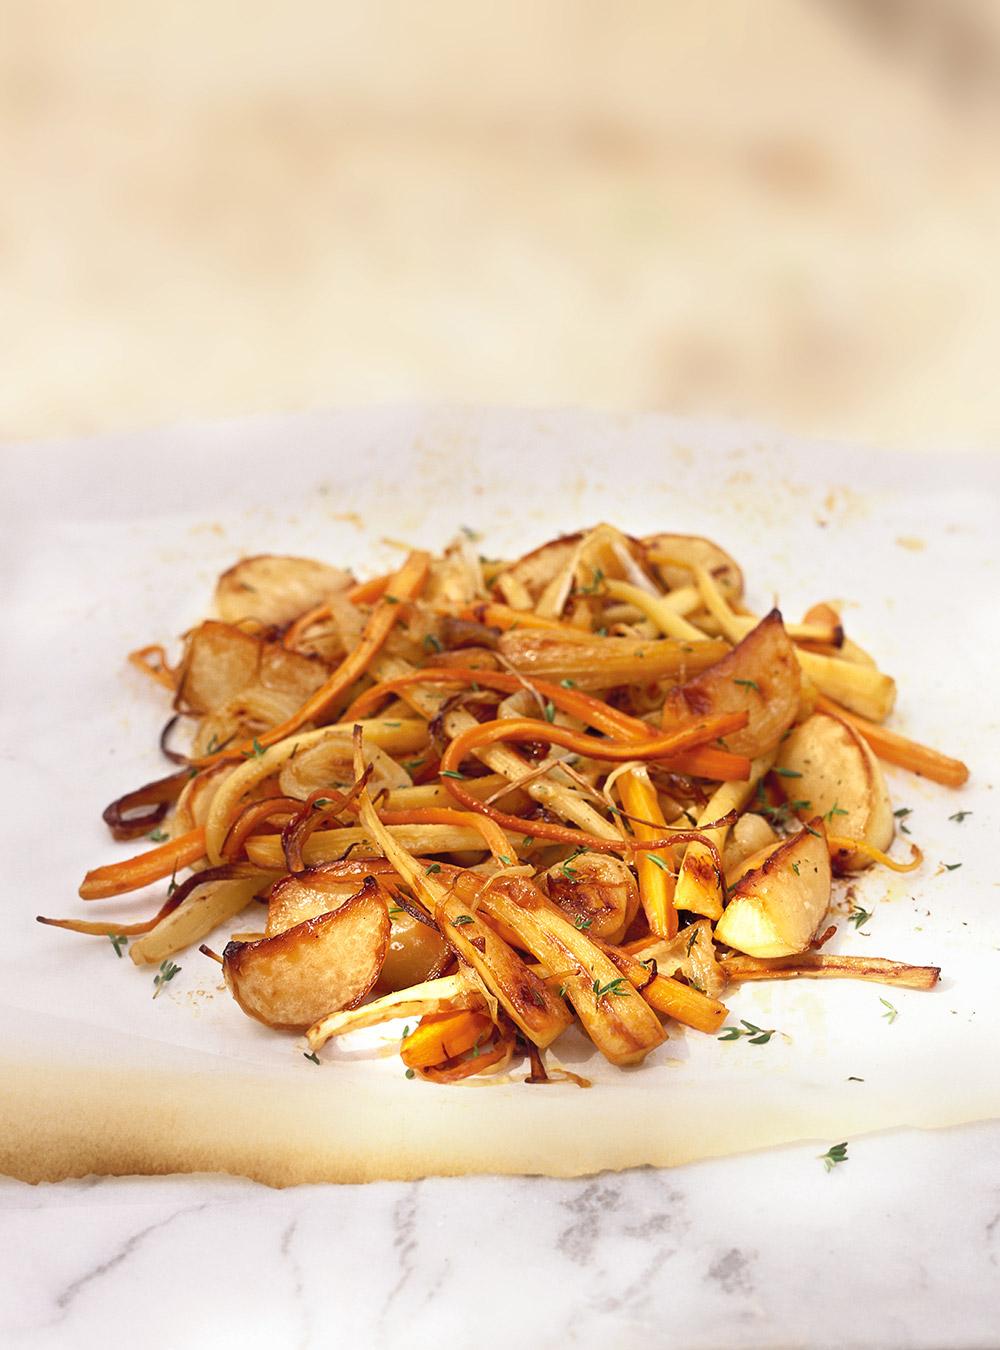 Légumes oubliés caramélisés | ricardo